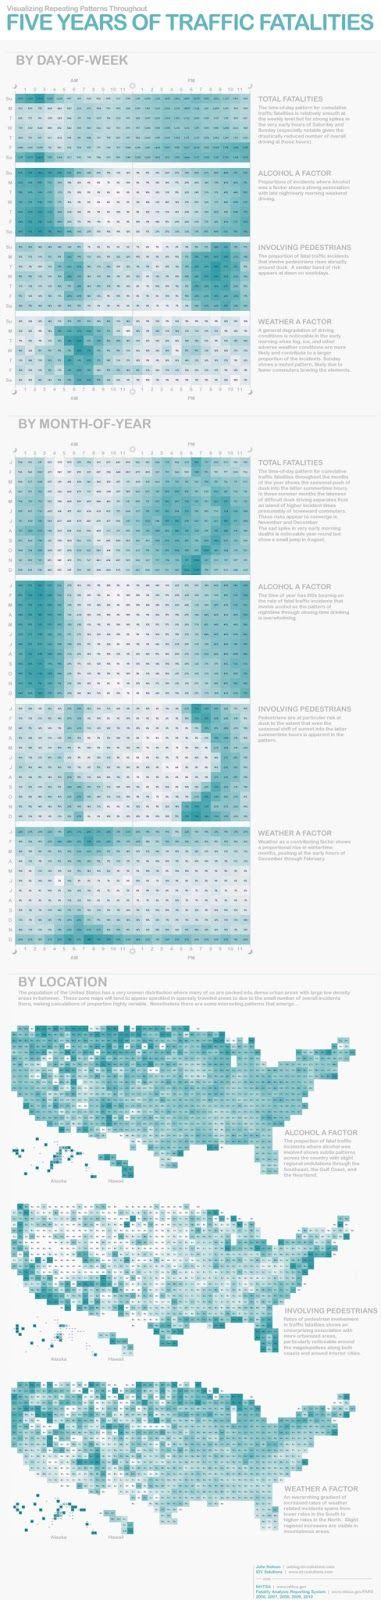 Data Visualization : Five Years of Traffic Fatalities